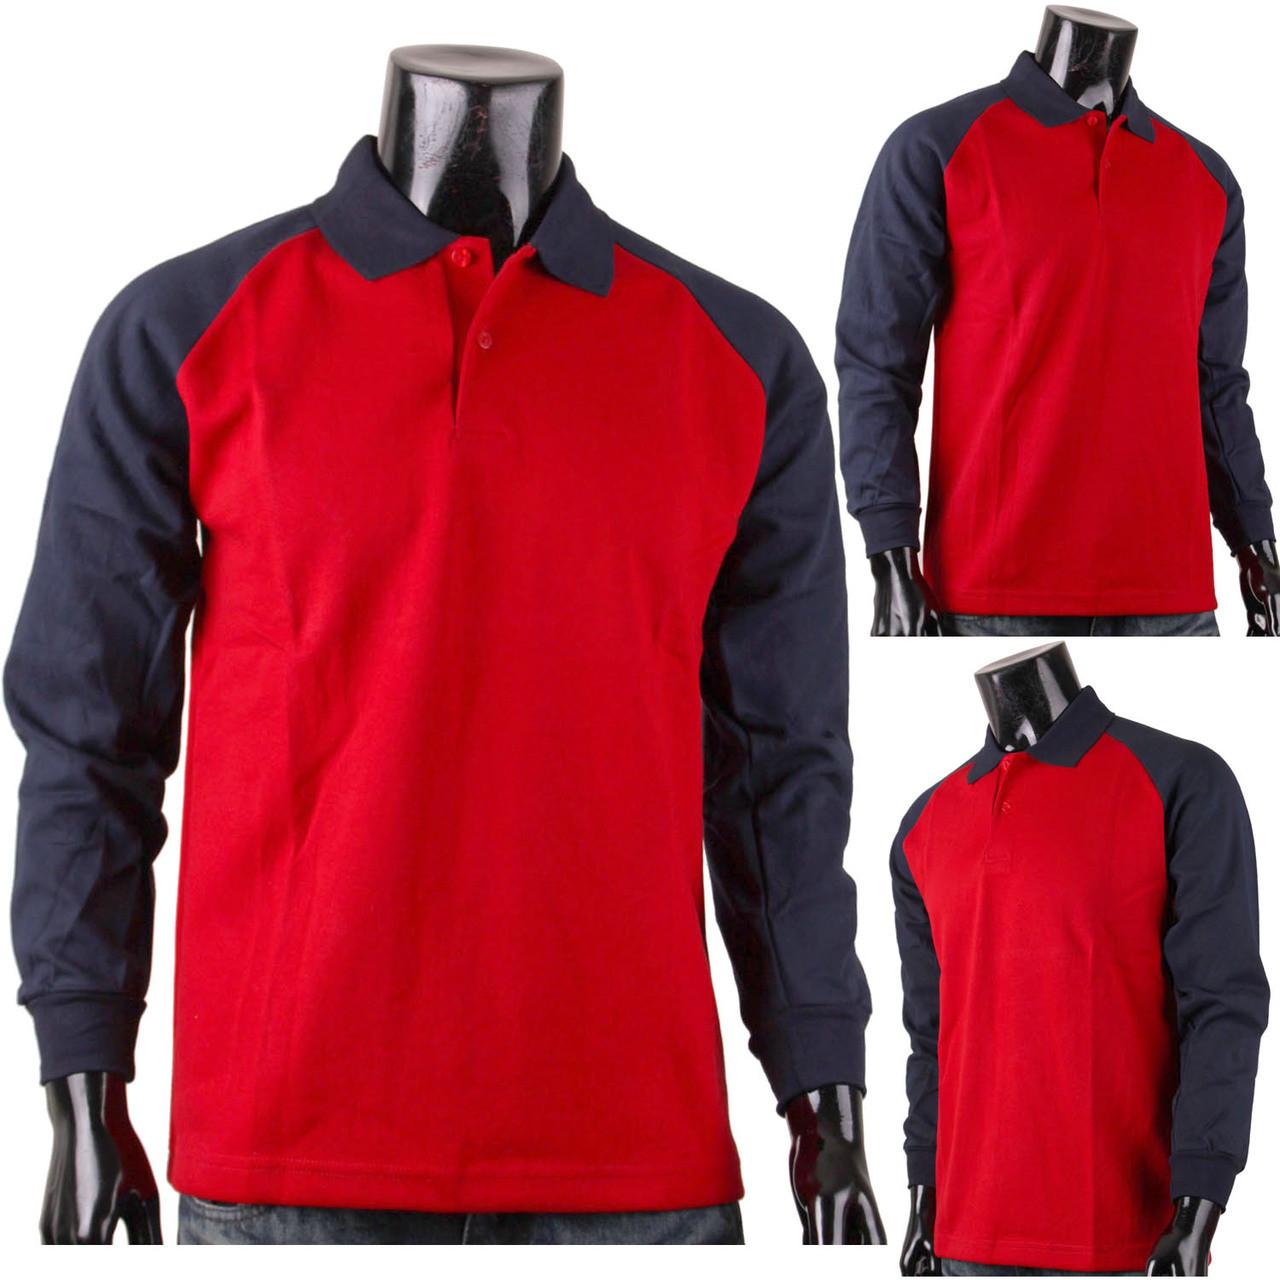 Classic Cotton Shirt Raglan Long Sleeve Red Polo Shirt